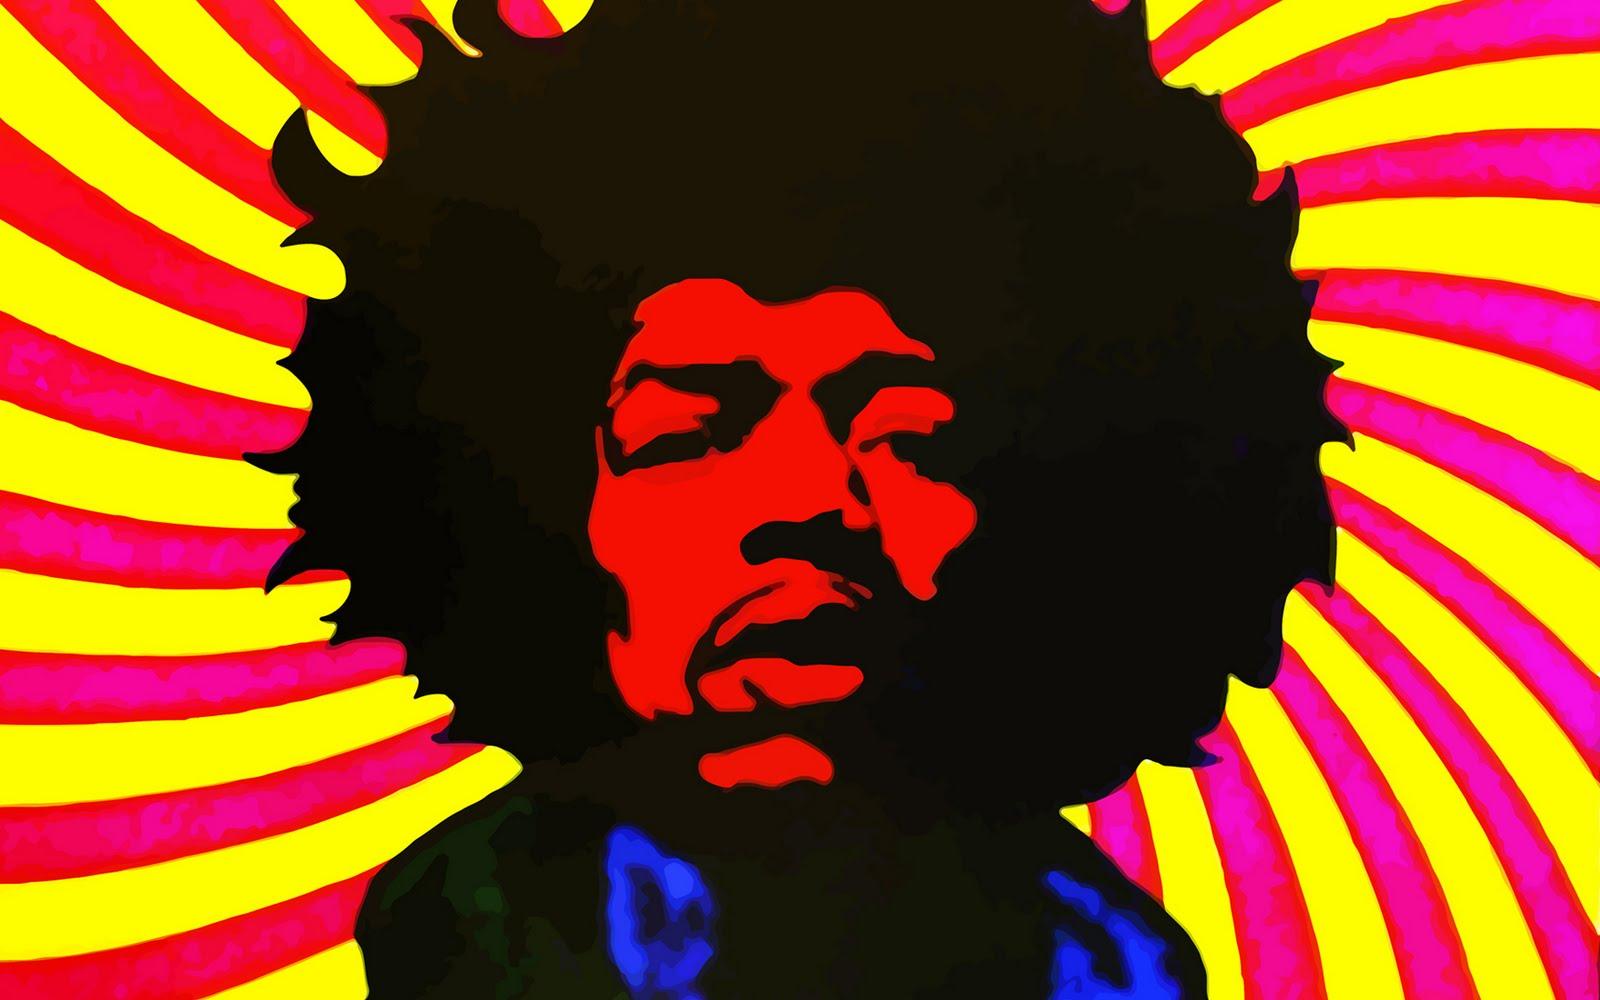 Jime Hendrix Experience Axis Bold As Love